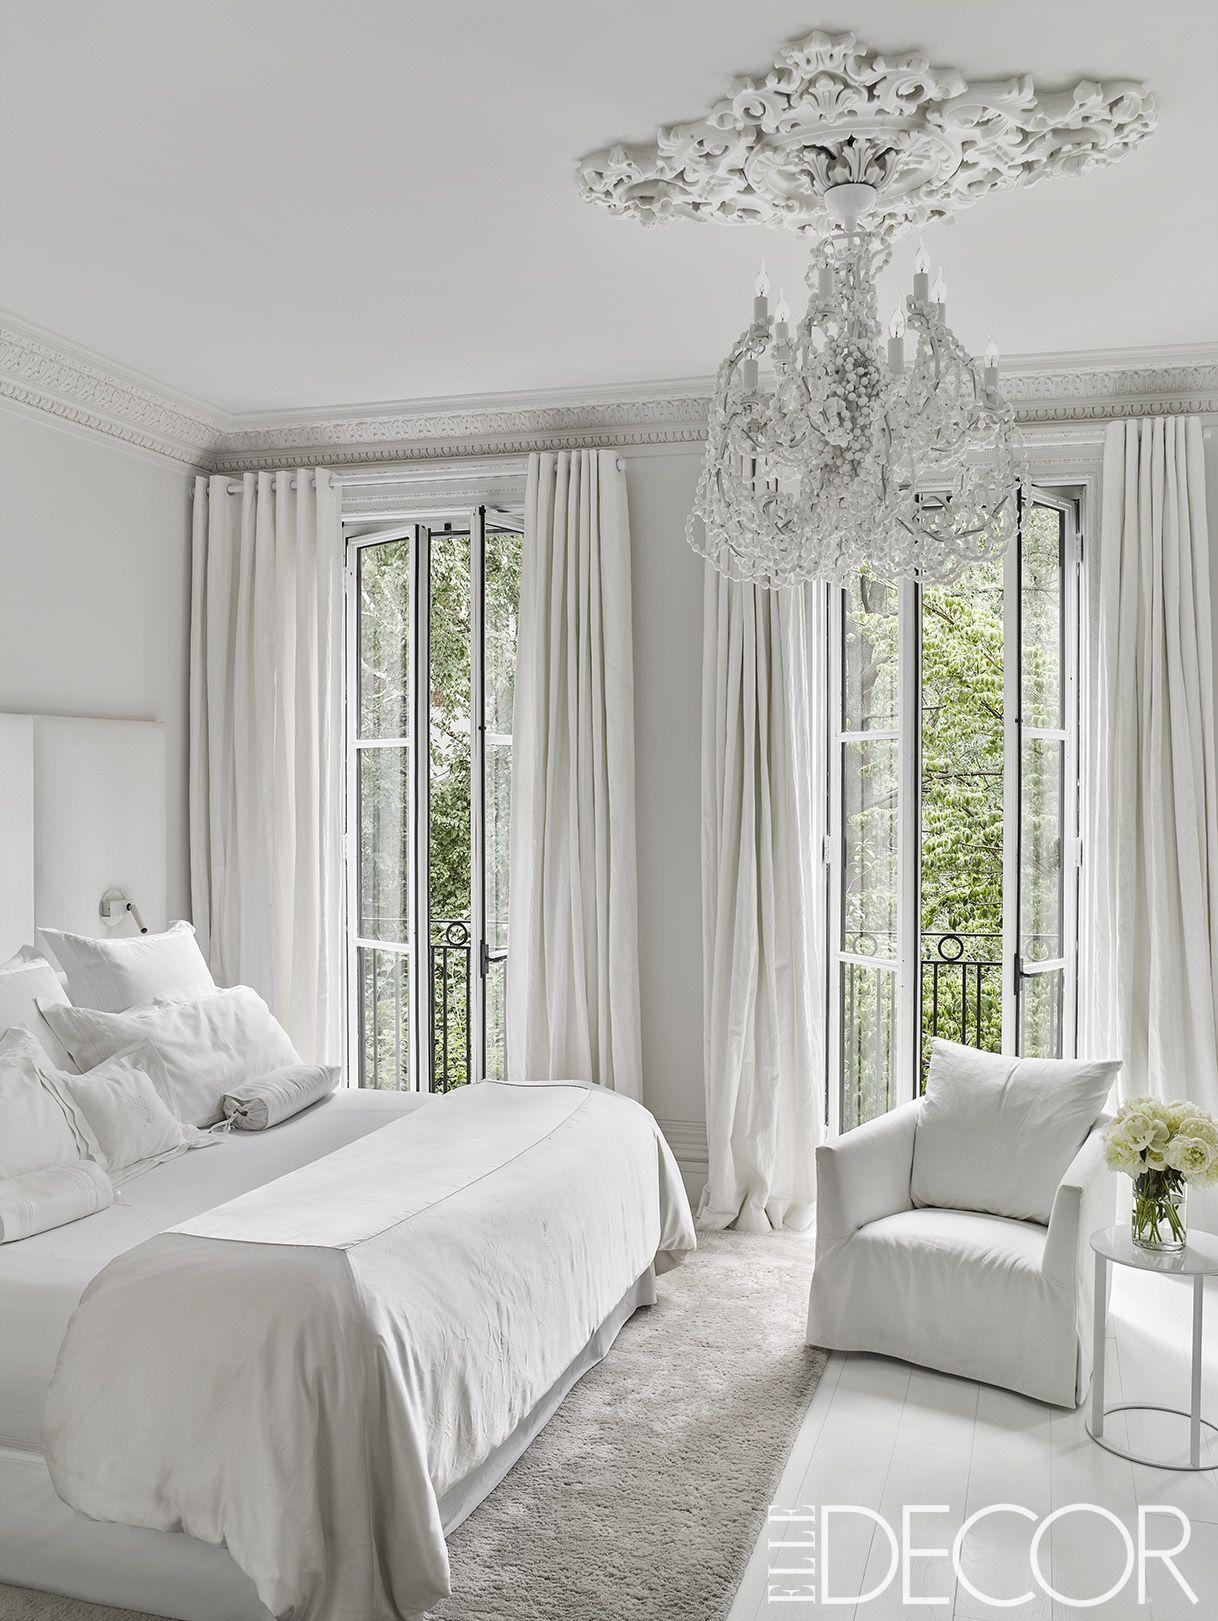 Minimalist Bedroom Decor Ideas For Maximum Relaxation Minimalist